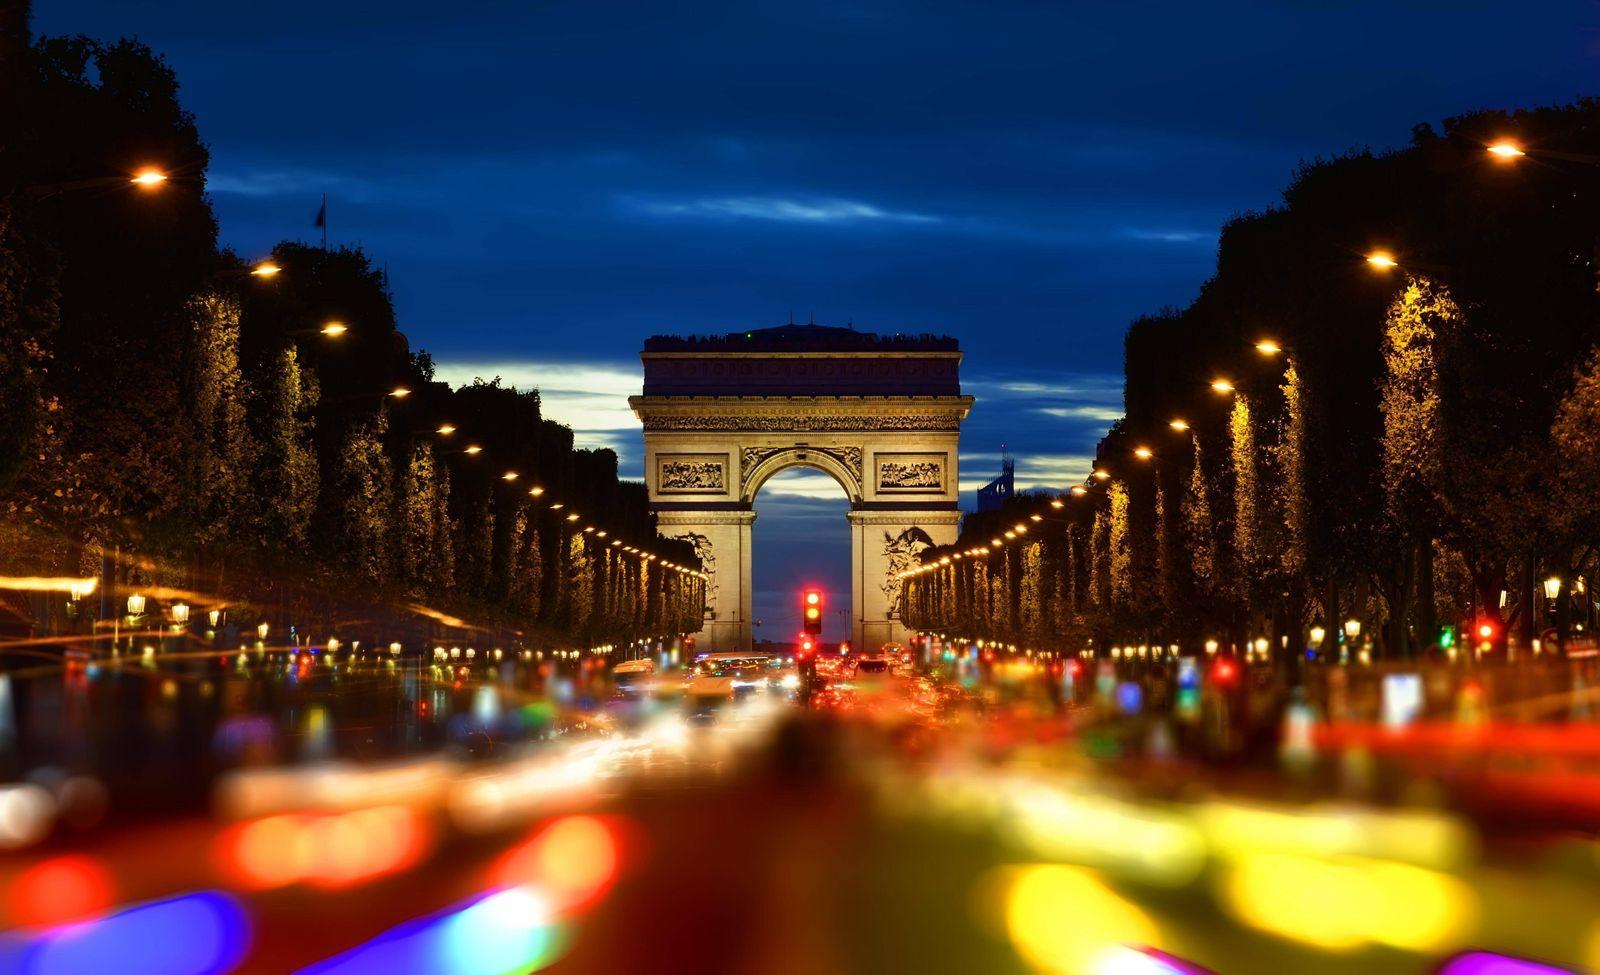 Champs Elysee in evening PUBLICATIONxINxGERxSUIxAUTxONLY Copyright xGivagax Panthermedia23411802